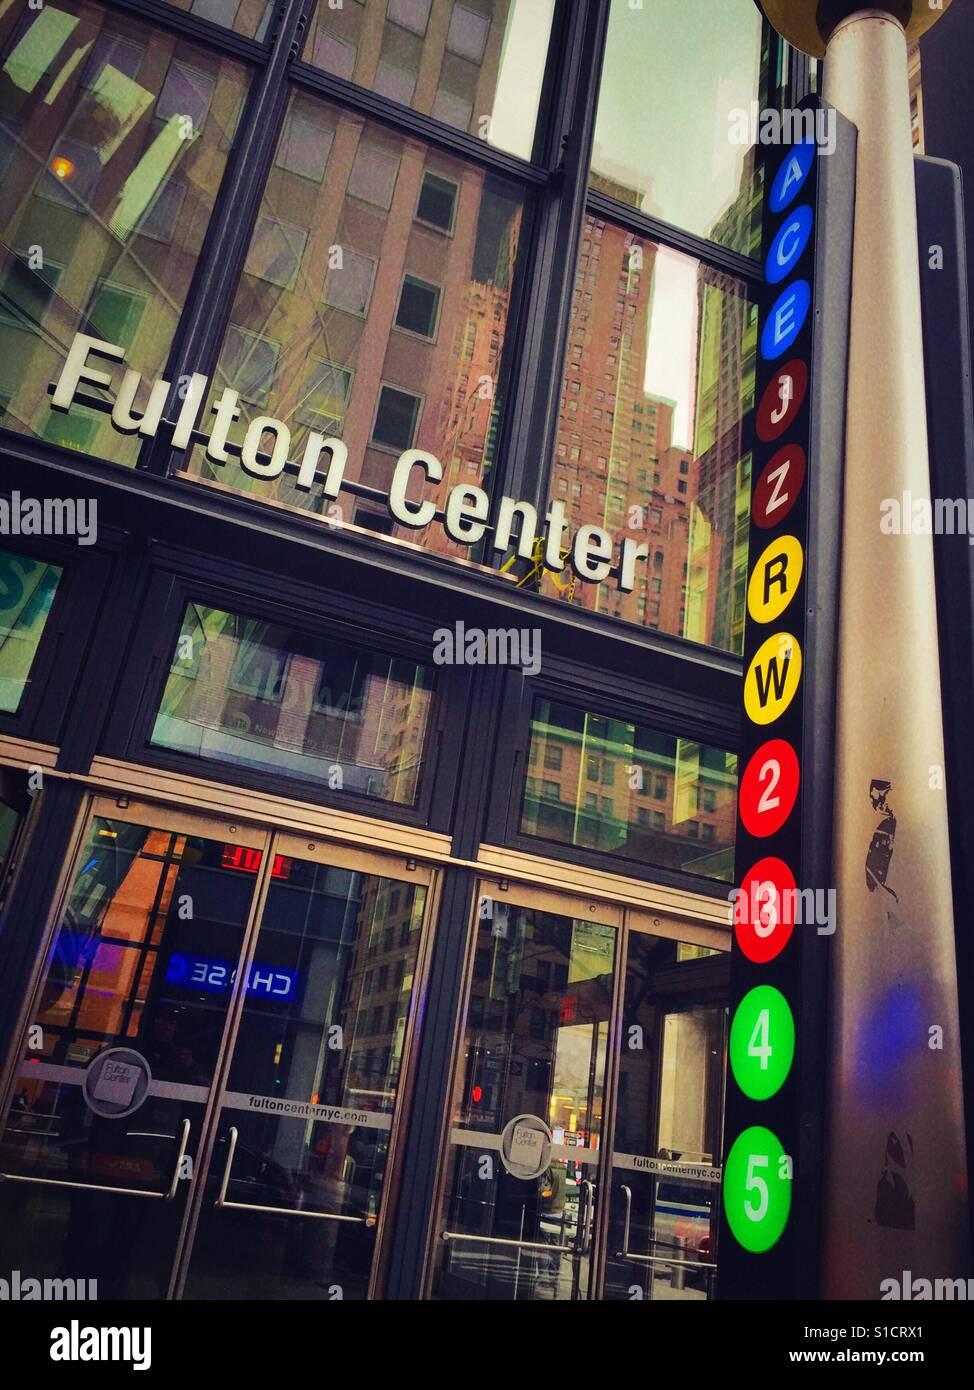 Subway line symbols at the fulton center station financial subway line symbols at the fulton center station financial district nyc usa biocorpaavc Gallery